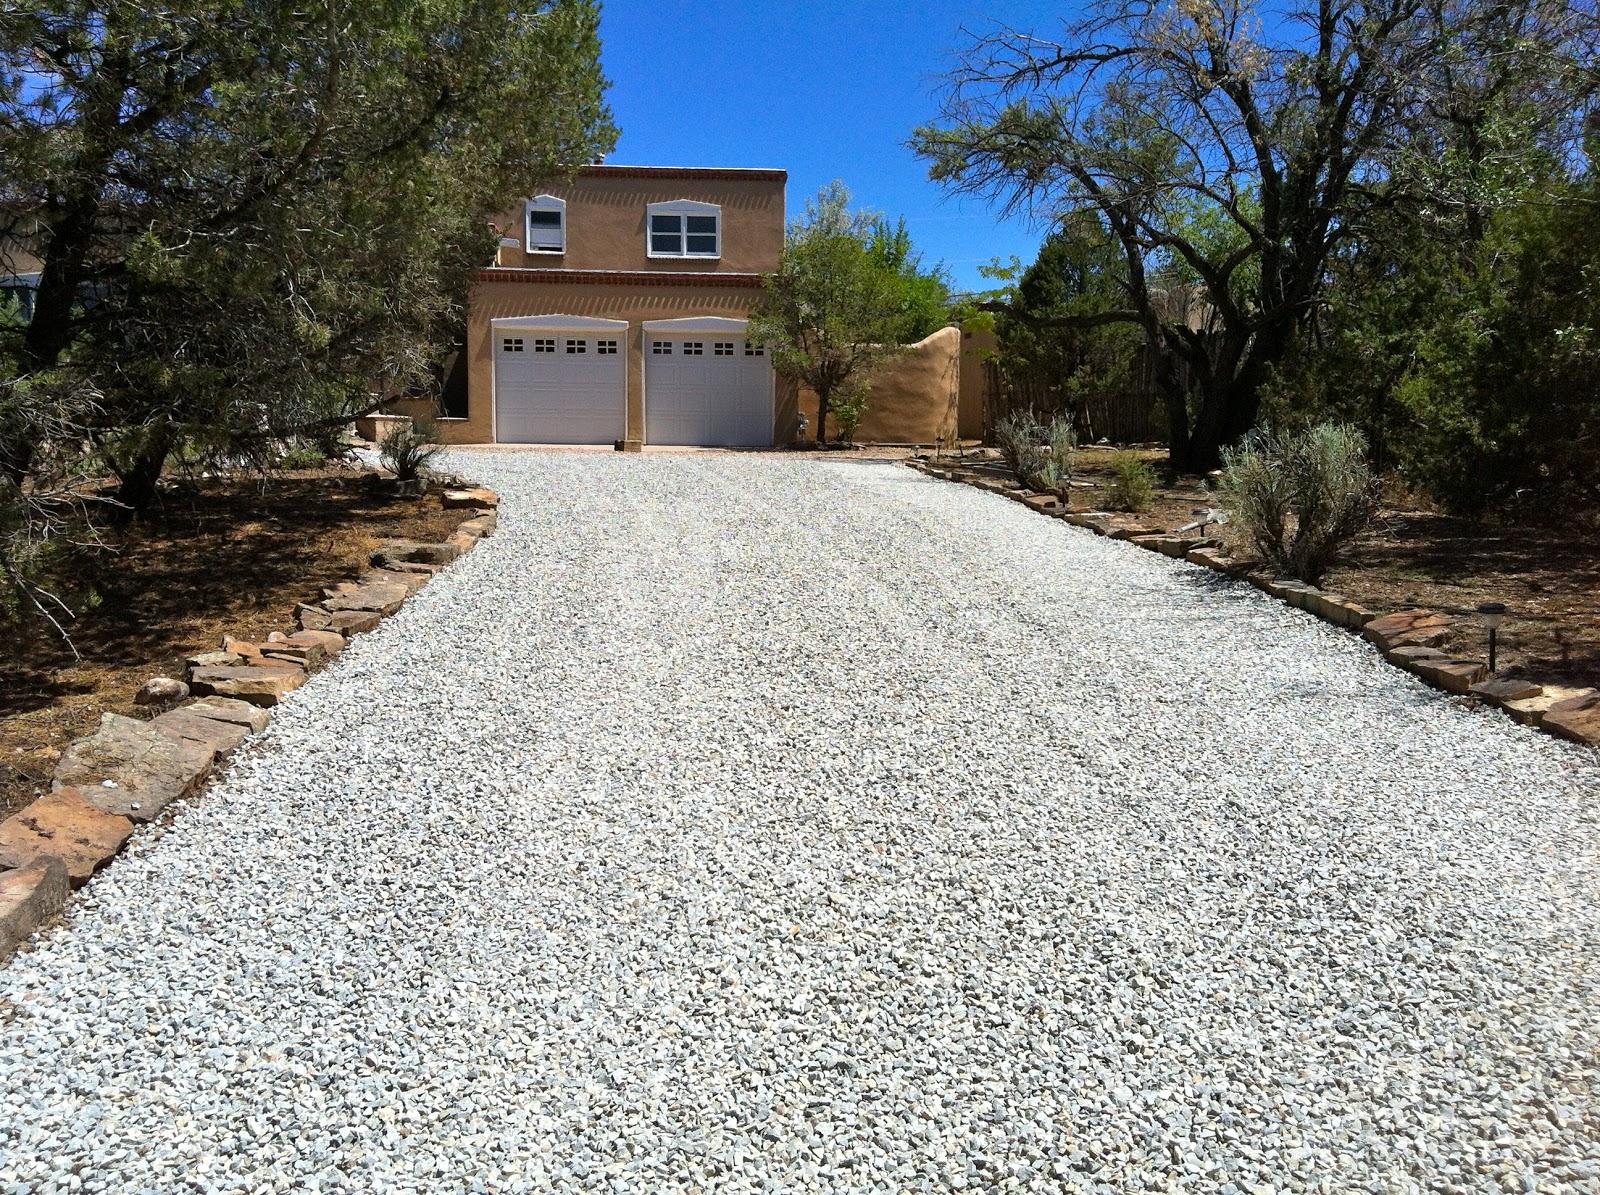 Best Gravel For Driveways Stone : Afj custom paving new gravel driveway